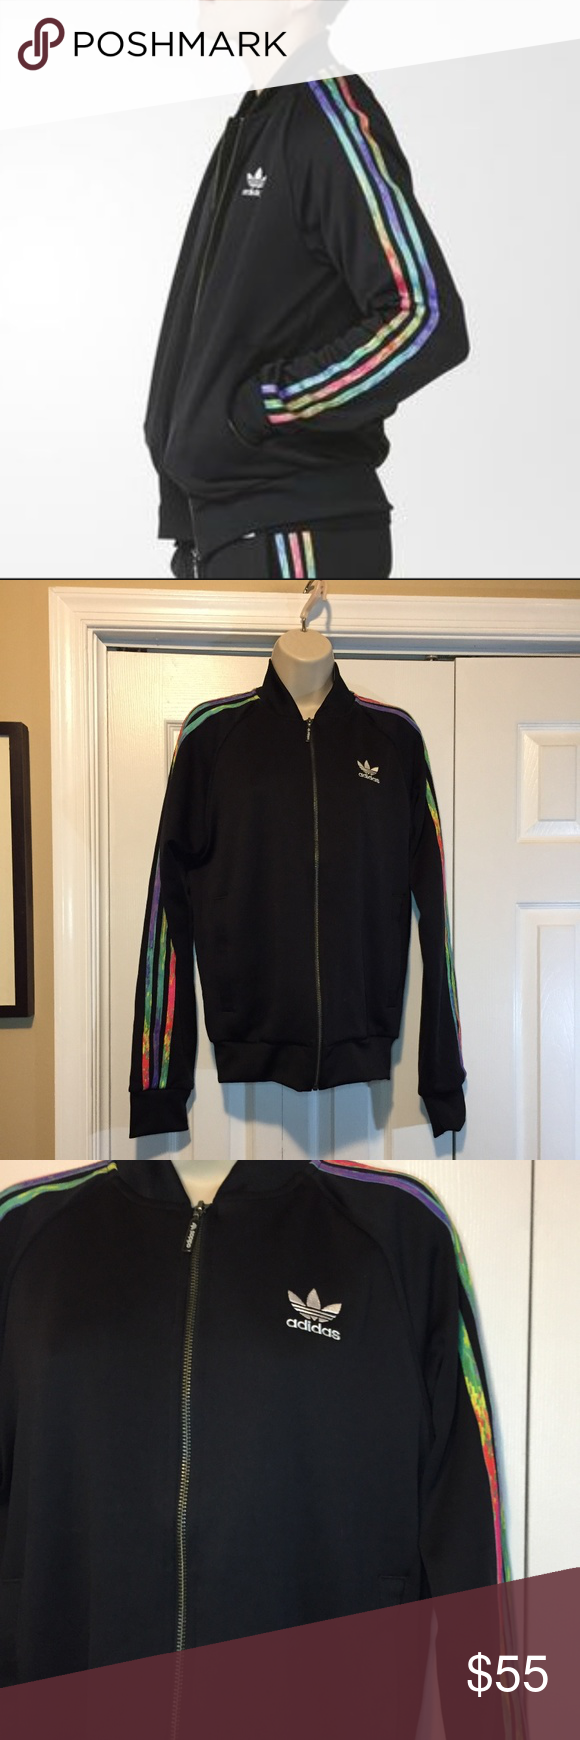 622fb03ab584 Adidas Originals LGBT Superstar Track Jacket S Excellent used condition. No  holes